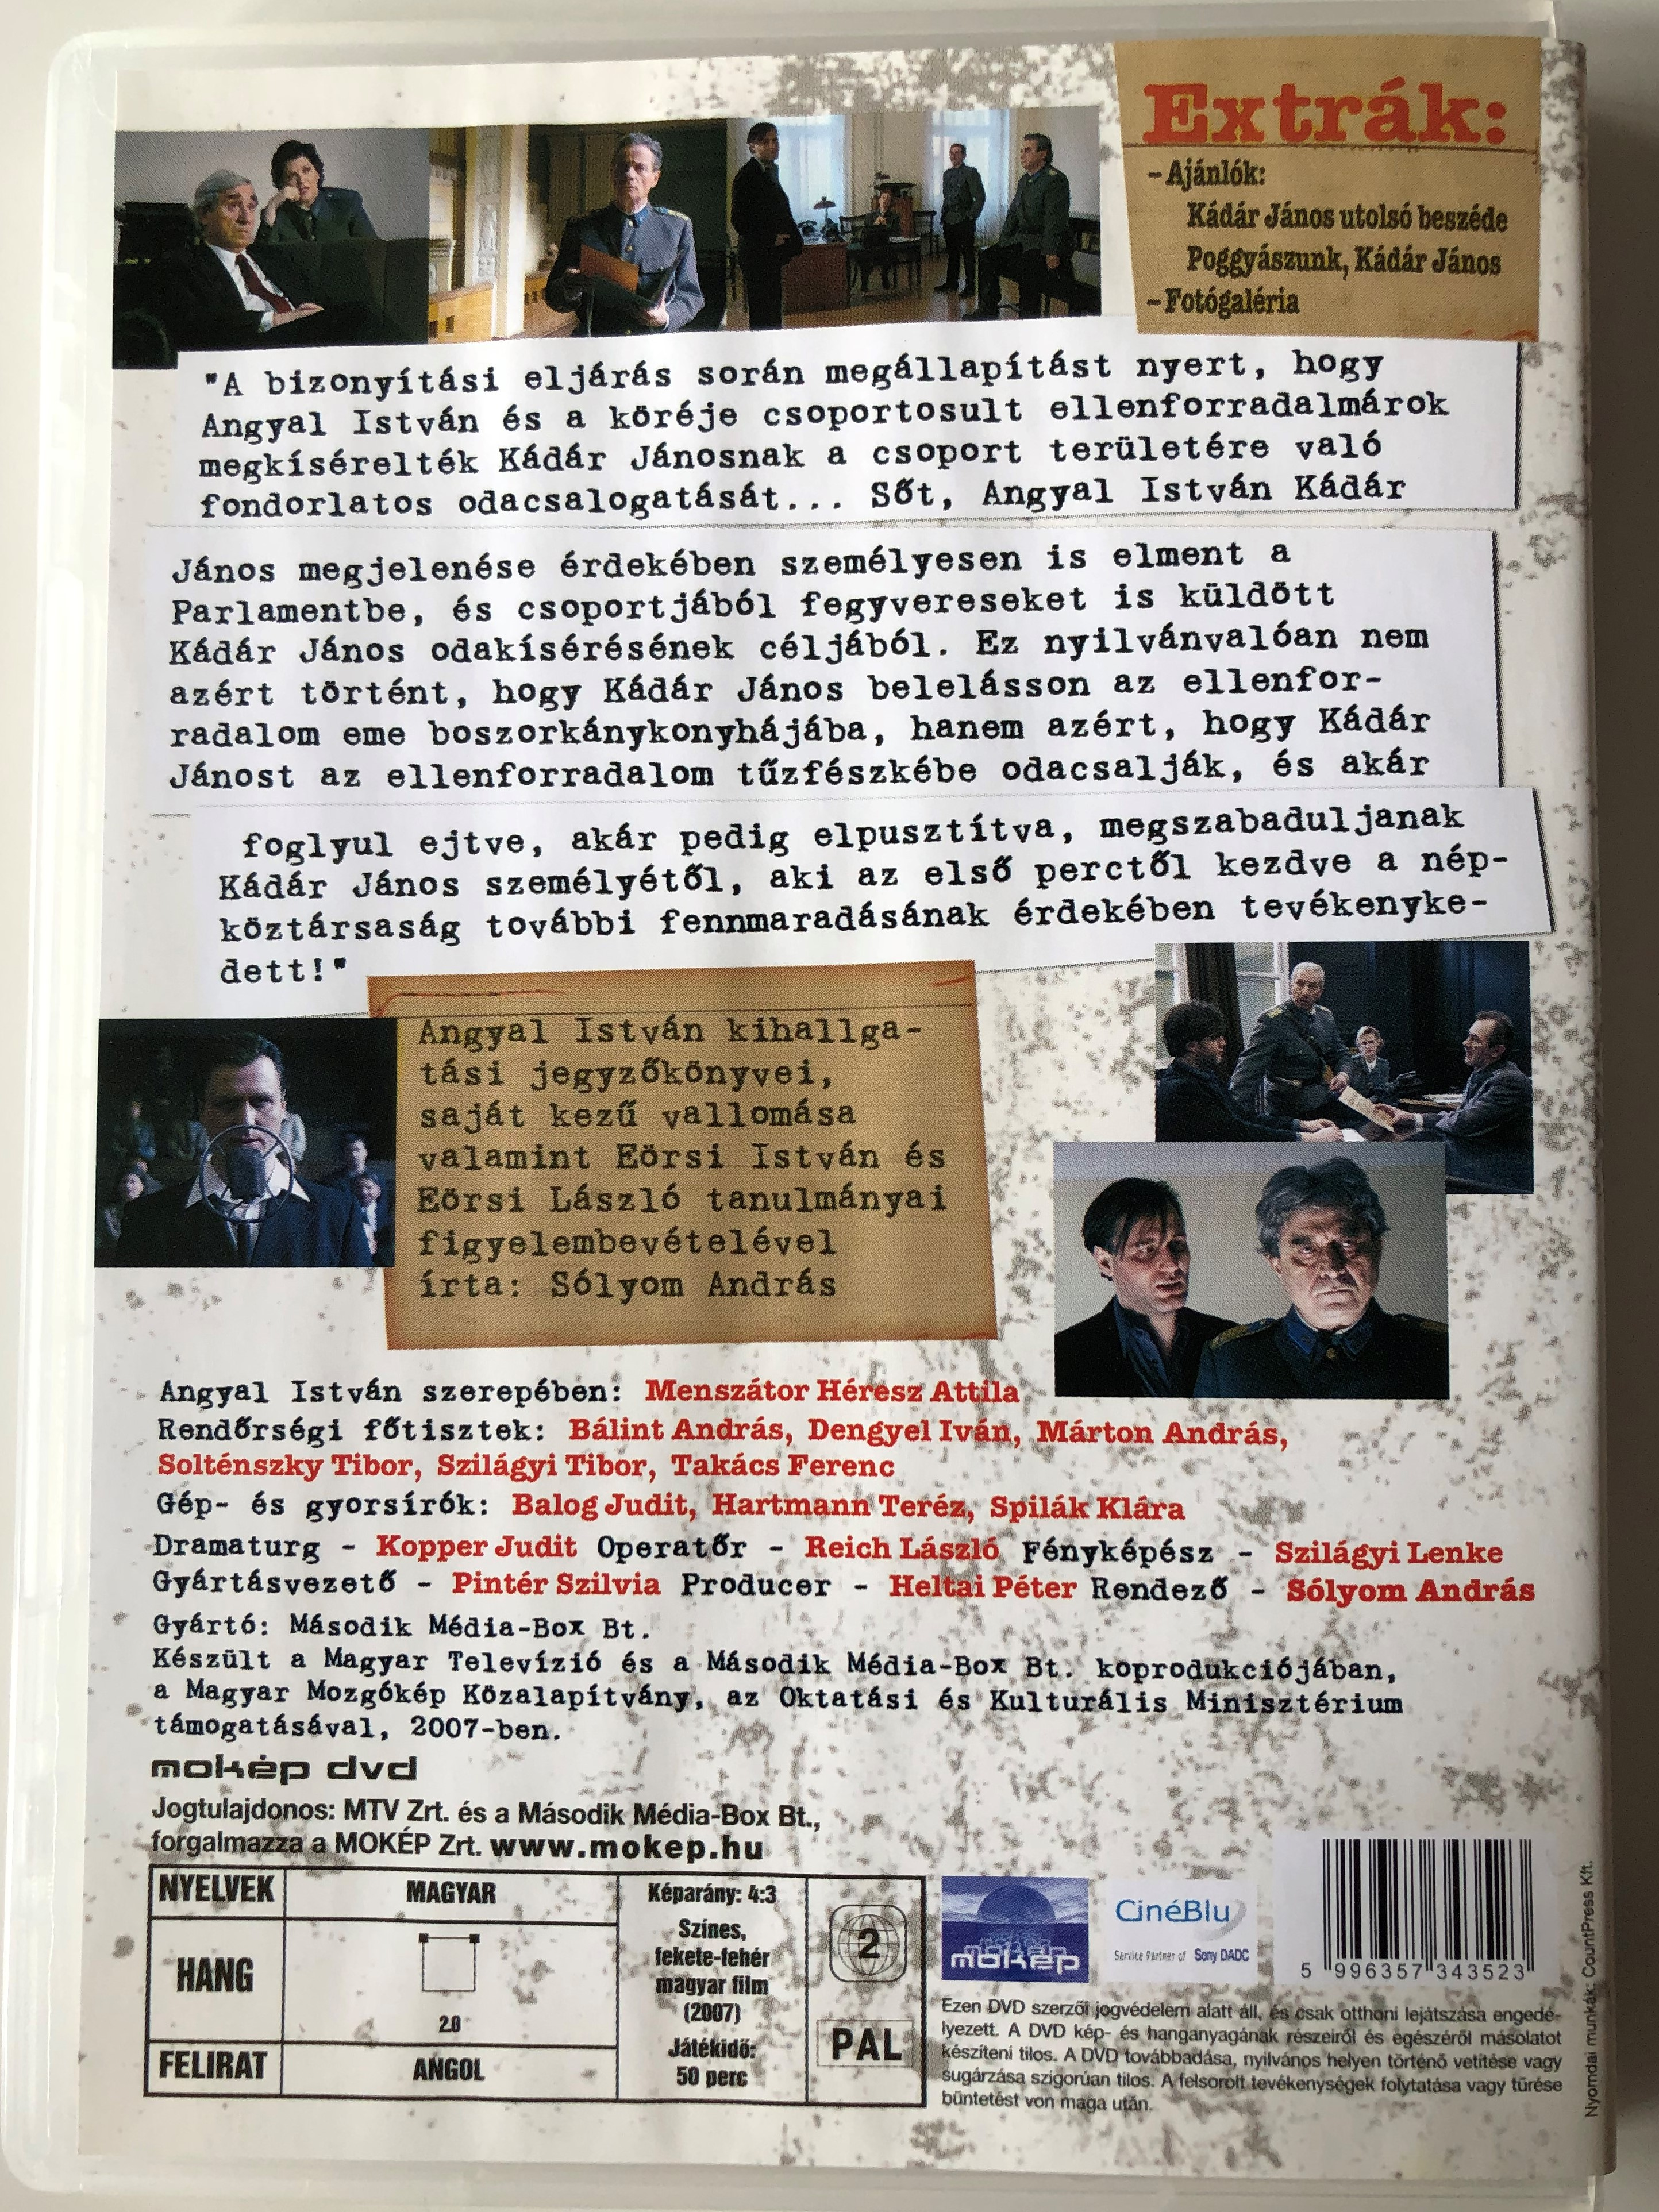 56-villan-s-dvd-2007-56-flashes-angyal-istv-n-1928-1958-2.jpg